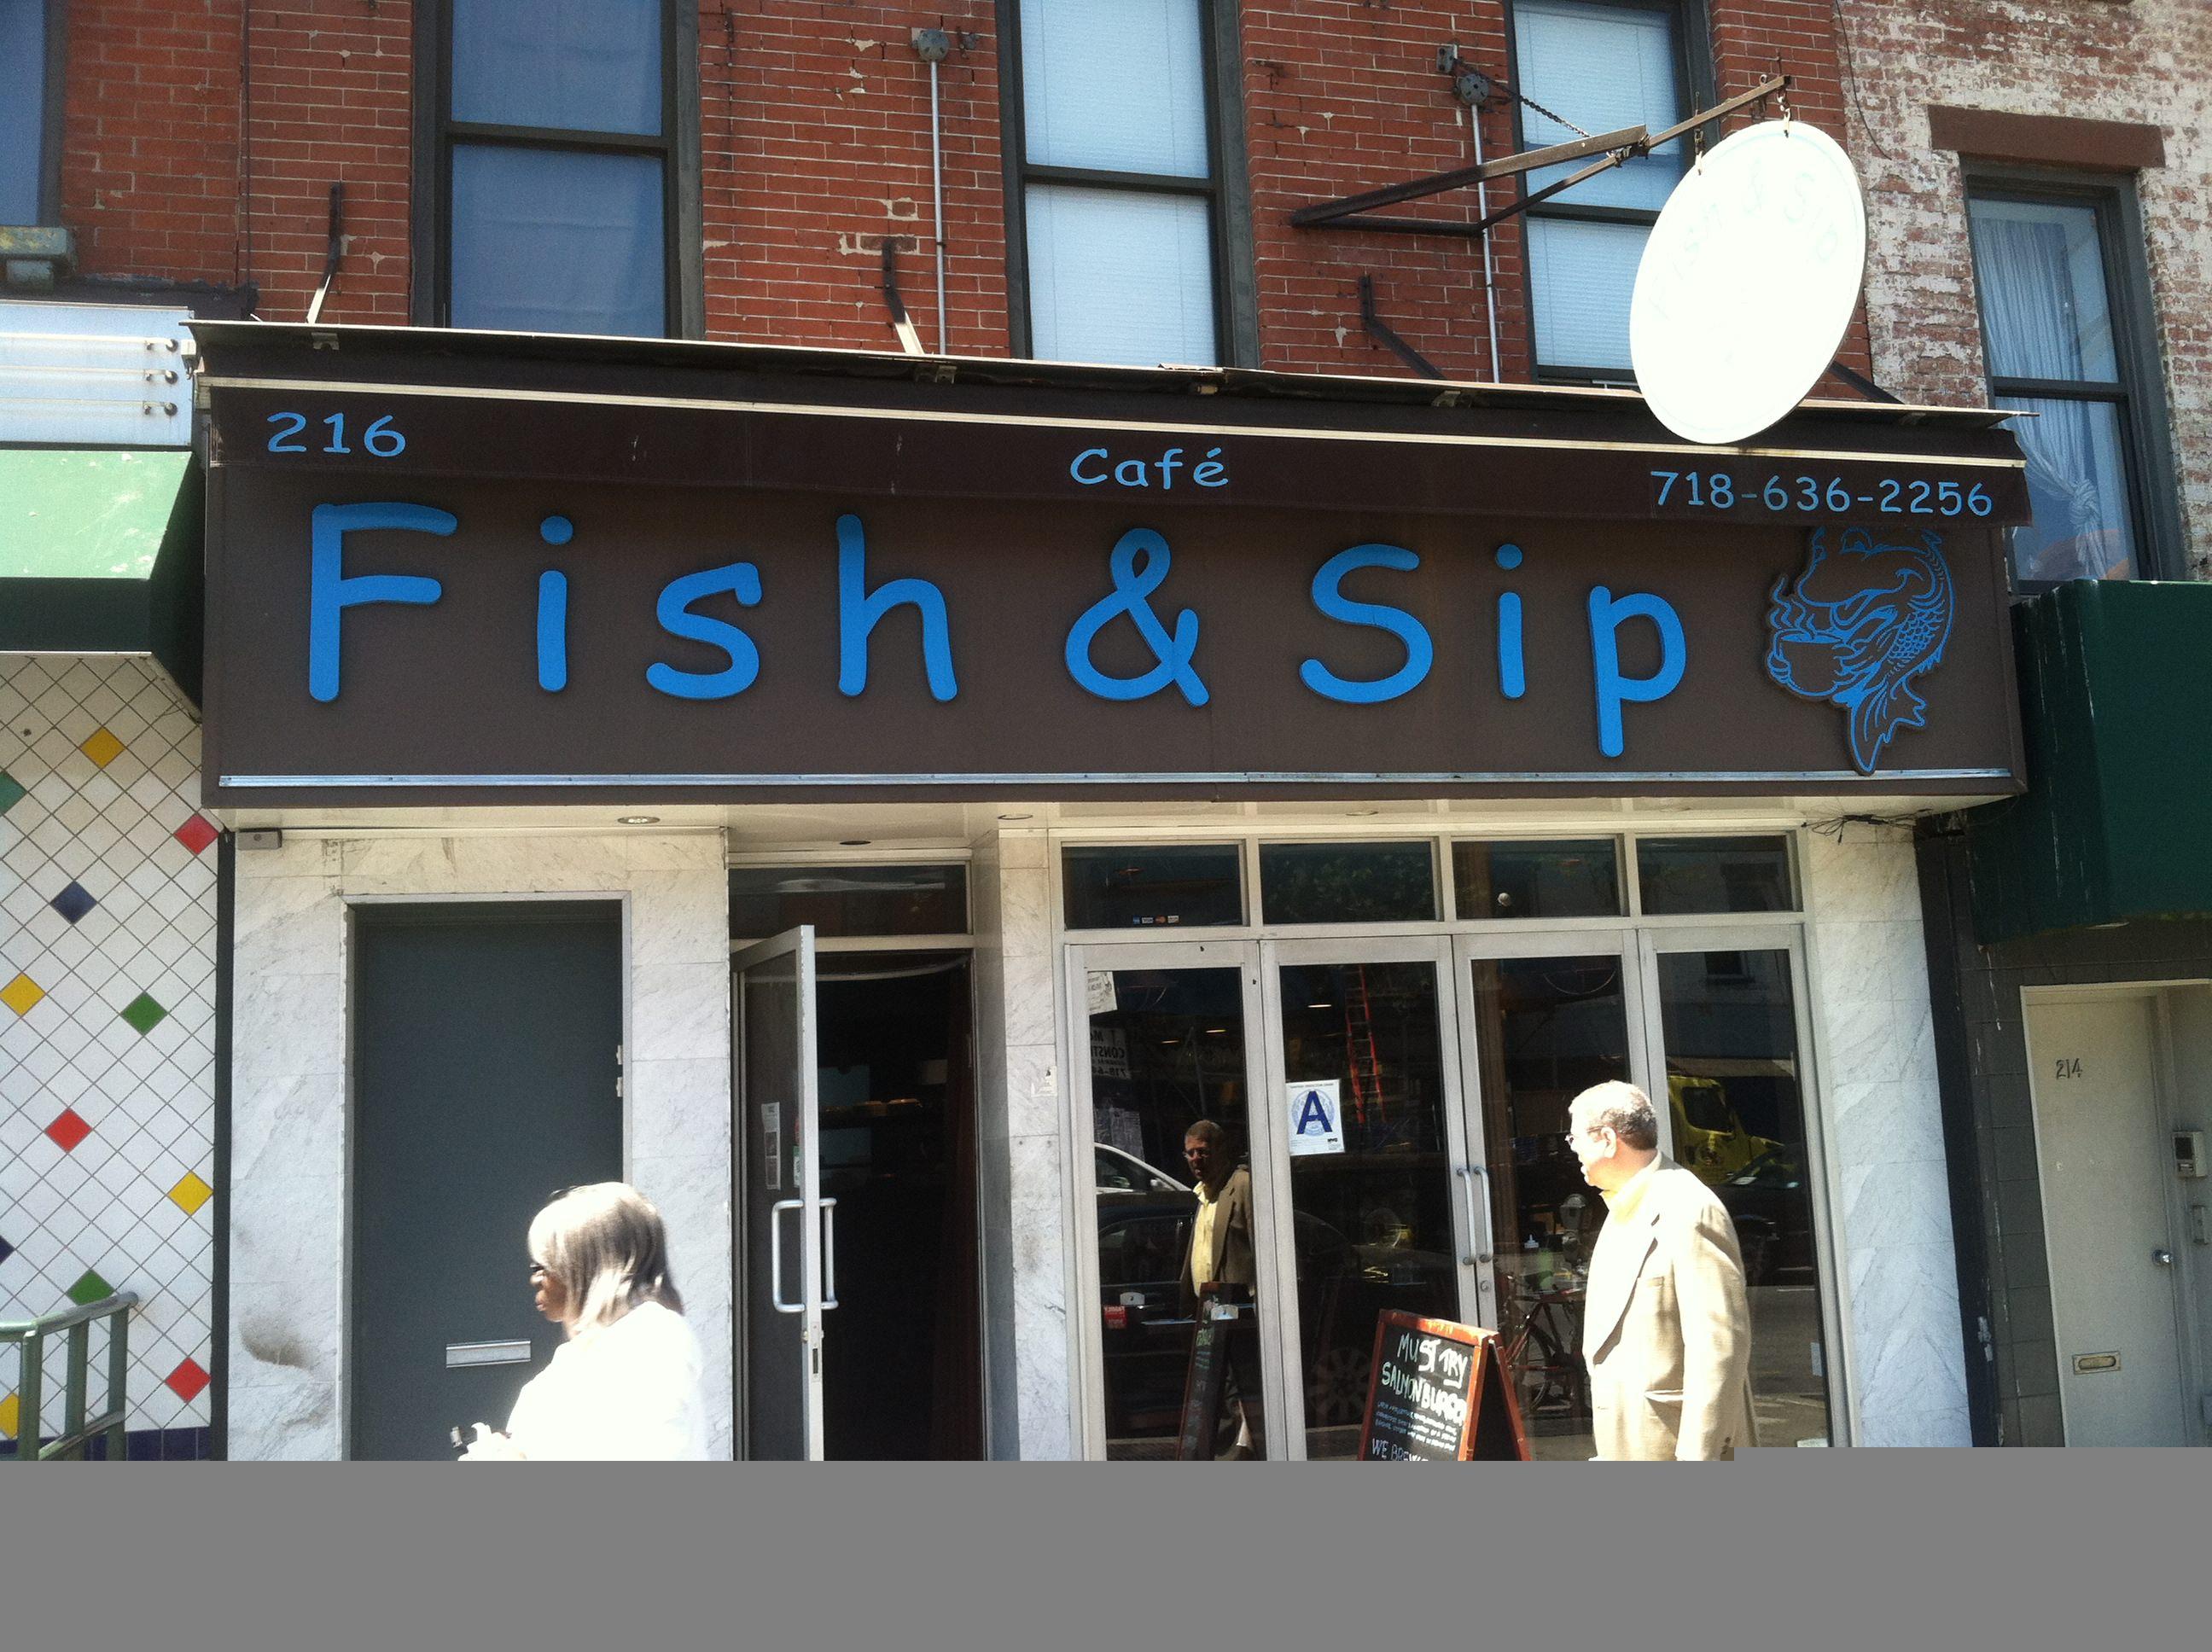 Fish & Sip Cafe